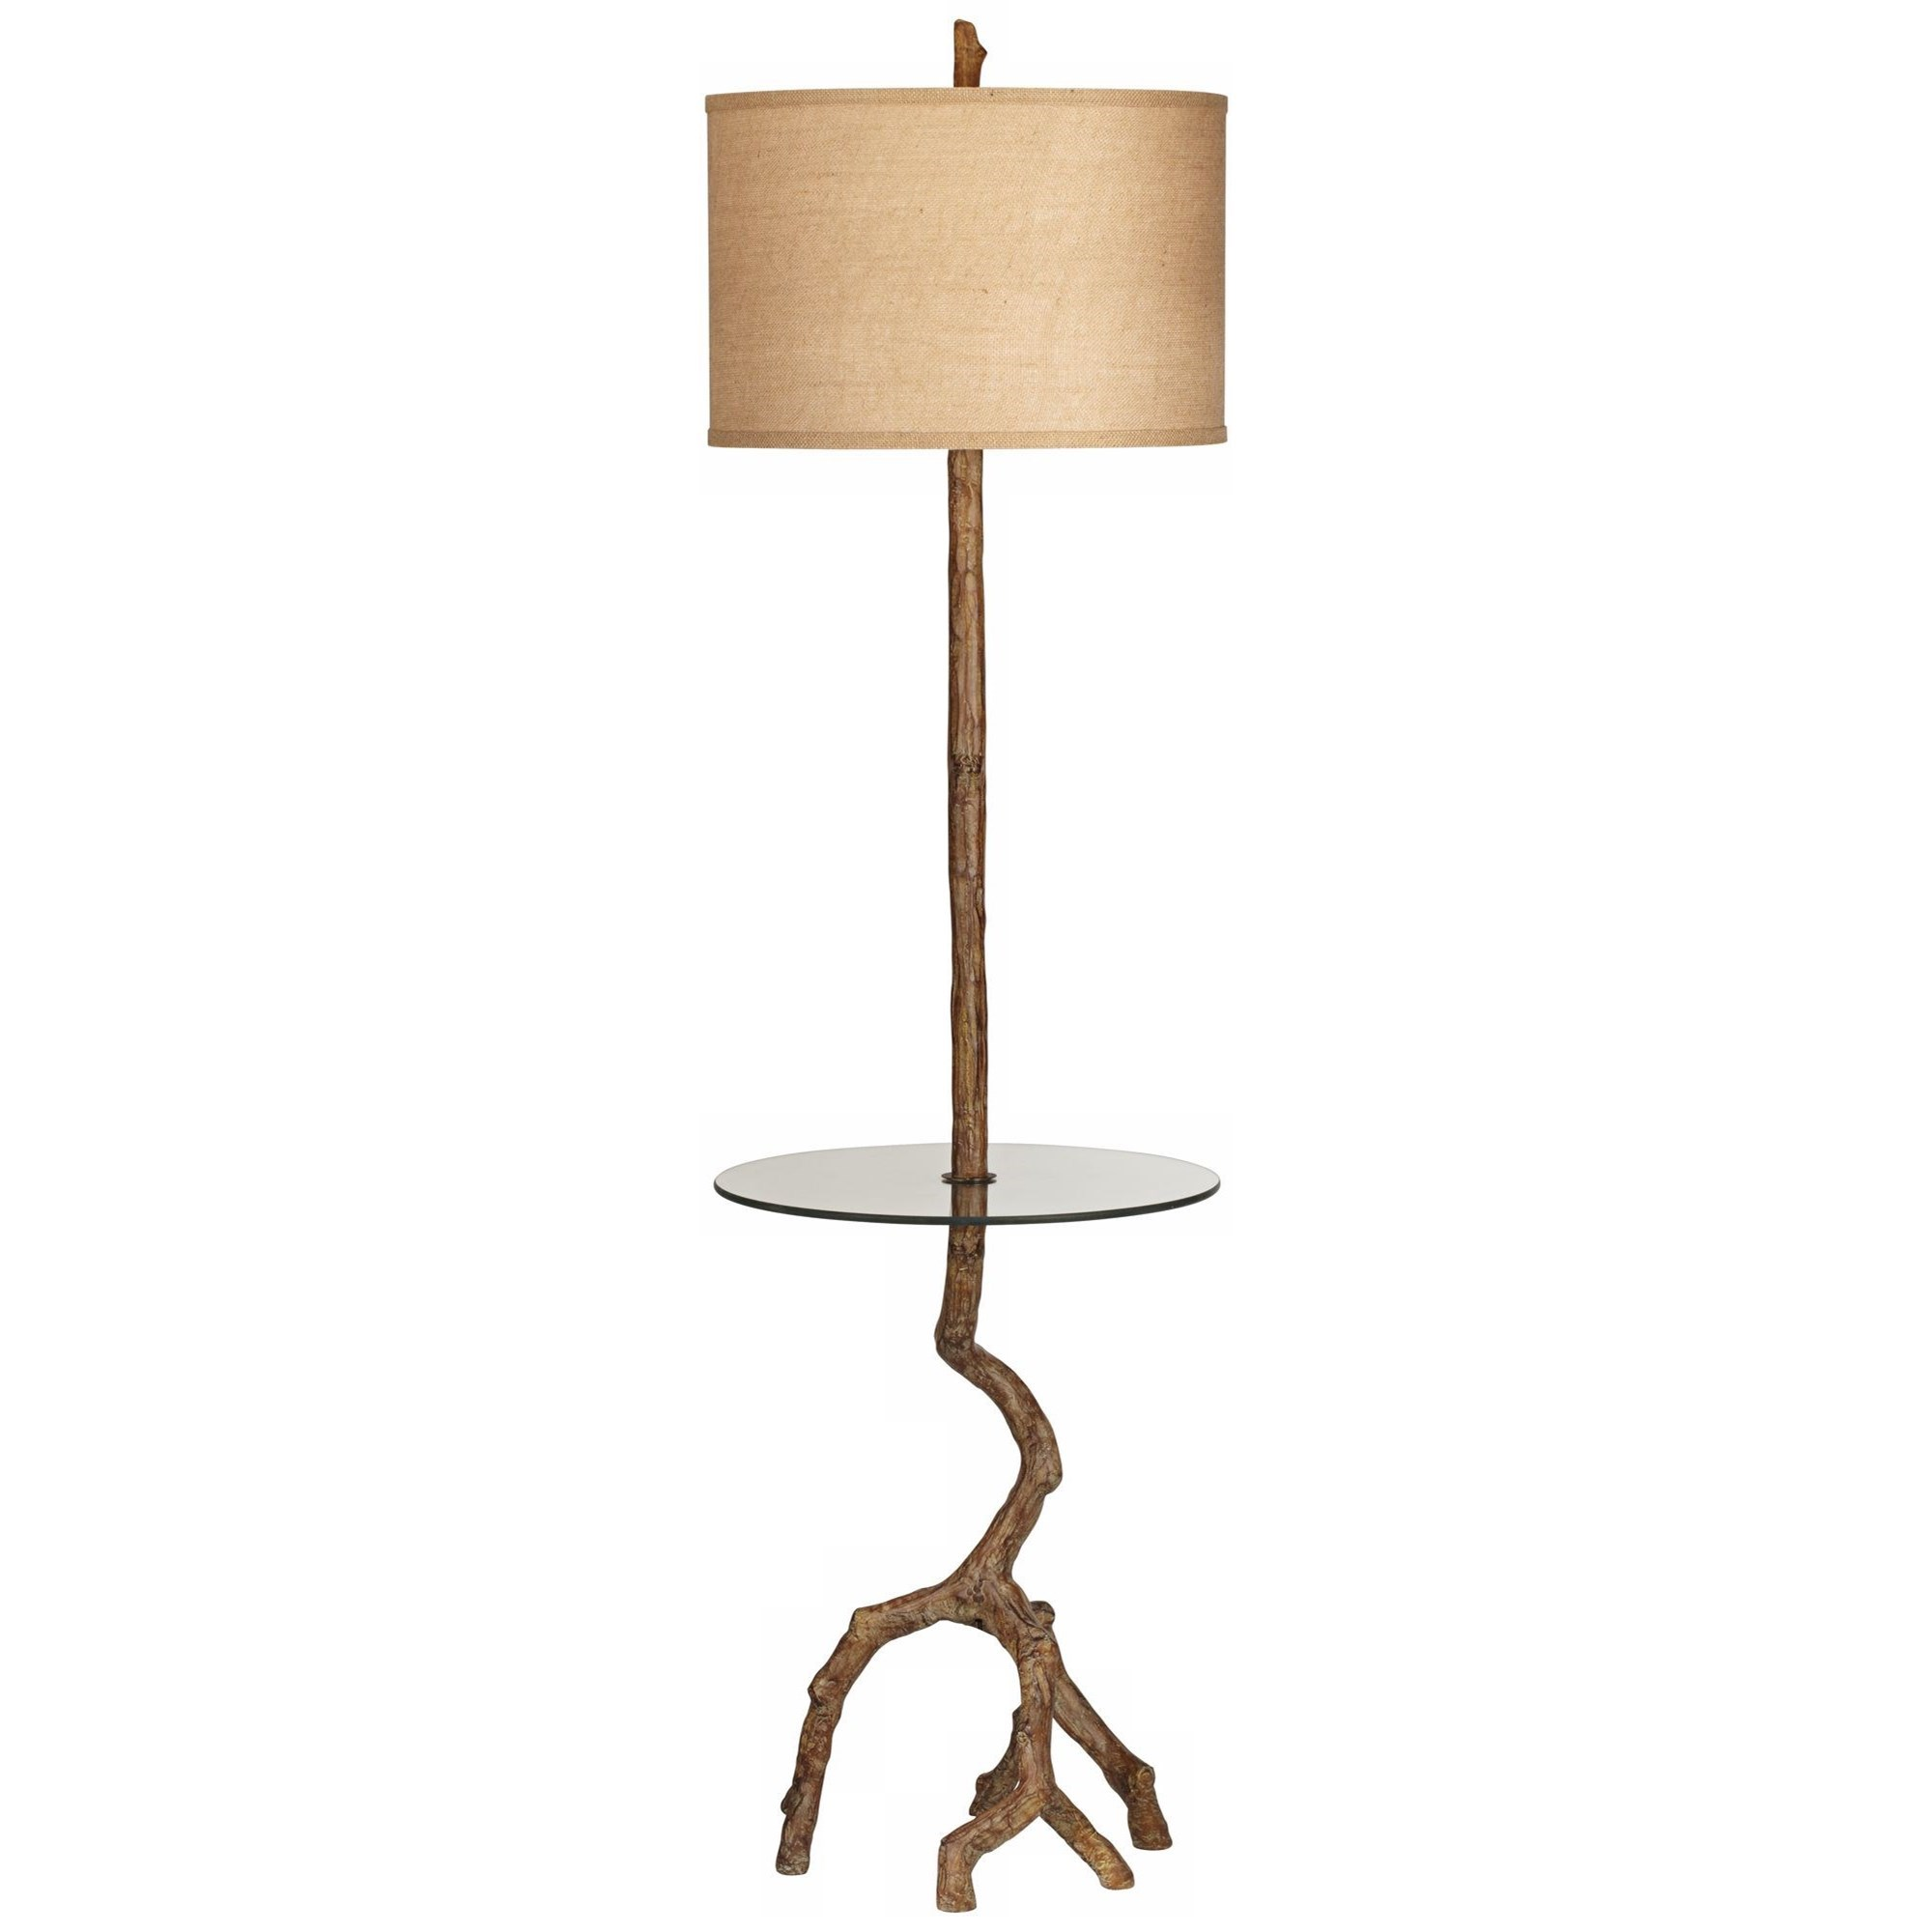 Floor Lamps Beachwood Floor Lamp at Bennett's Furniture and Mattresses